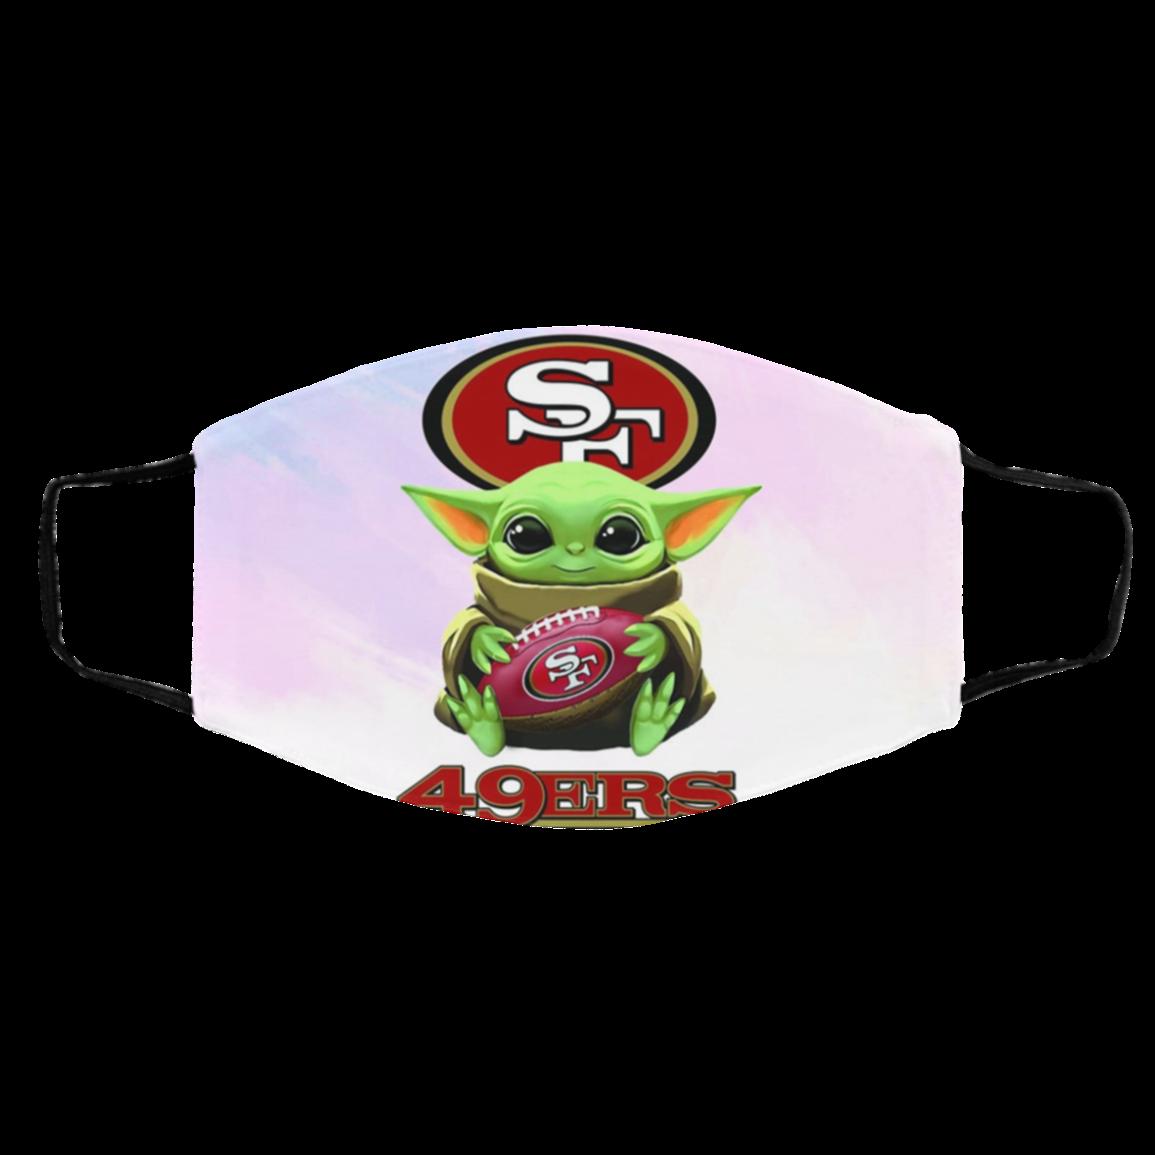 Ba-by Yod-a h-ug Sa-n Fra-ncisco 49ers NFL Face Mask